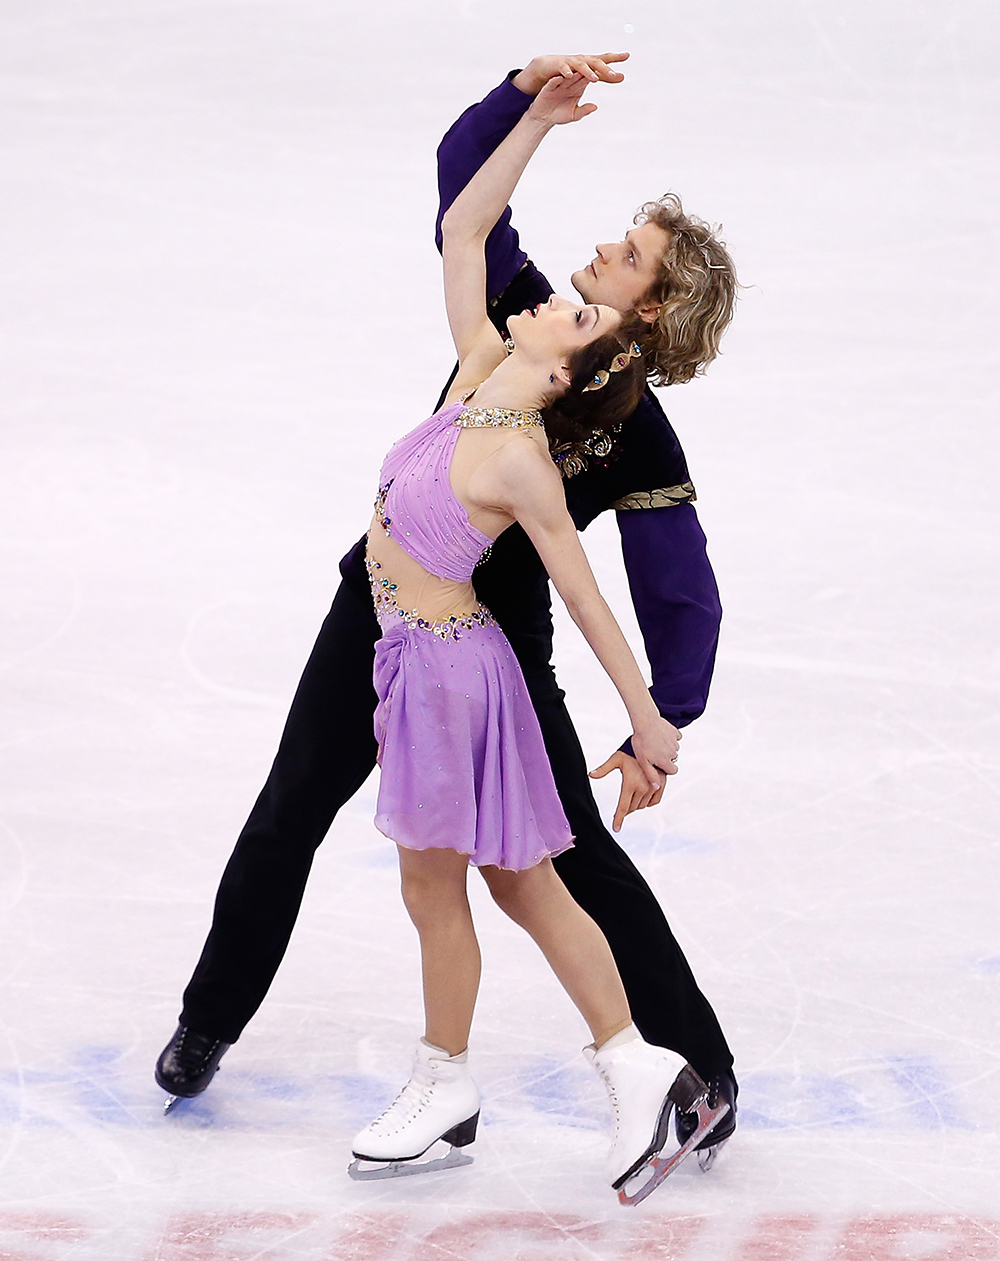 Duo Figure Skaters -Meryl Davis & Charlie White, Photo courtesy of Intimissimi